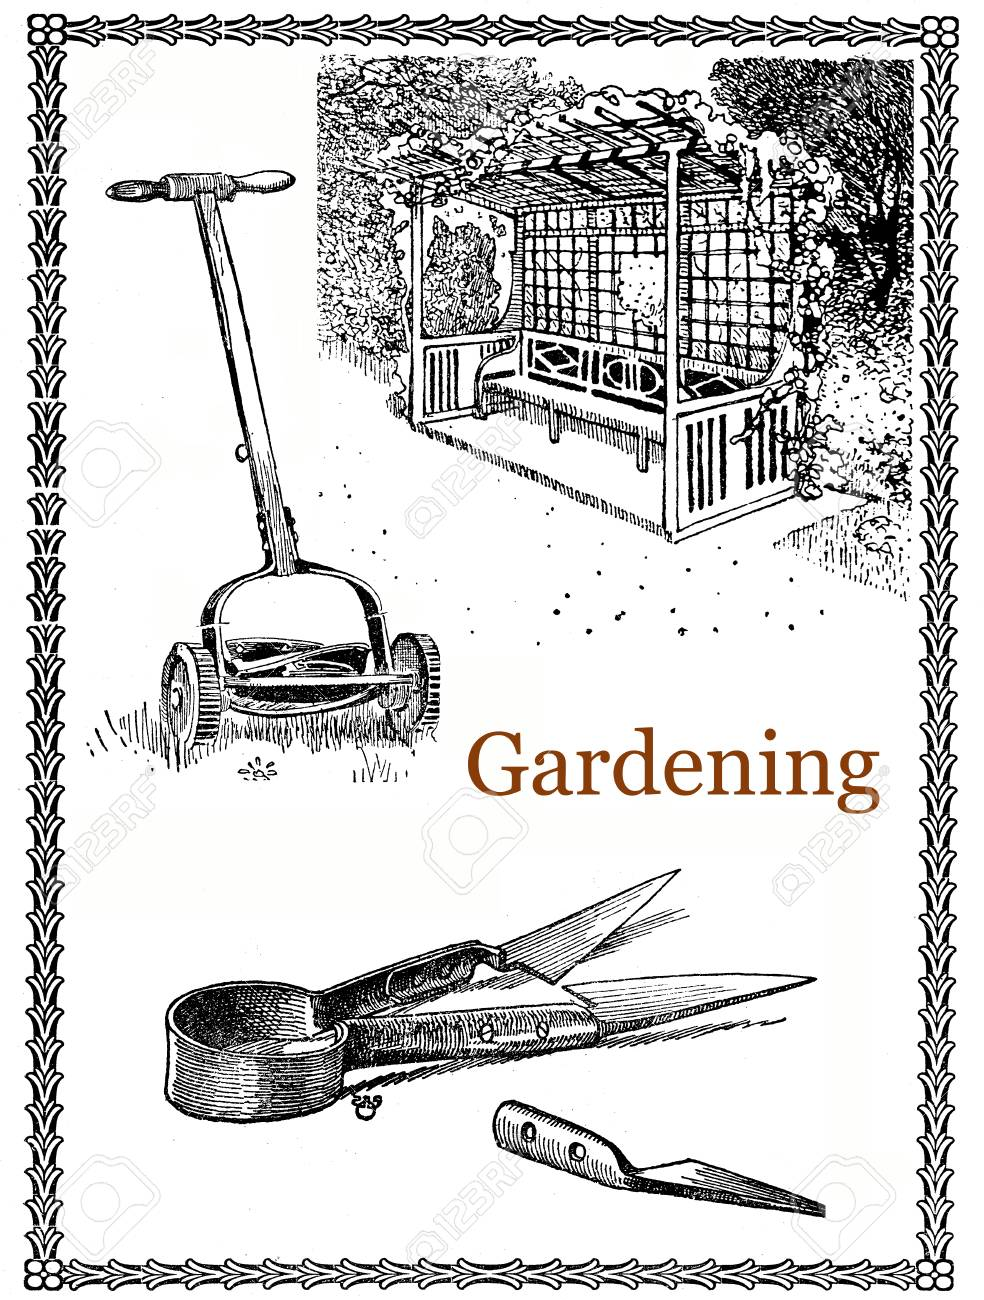 Vintage Gardening Engraving, Elegant Frame With Lawn Mower, Tools ...